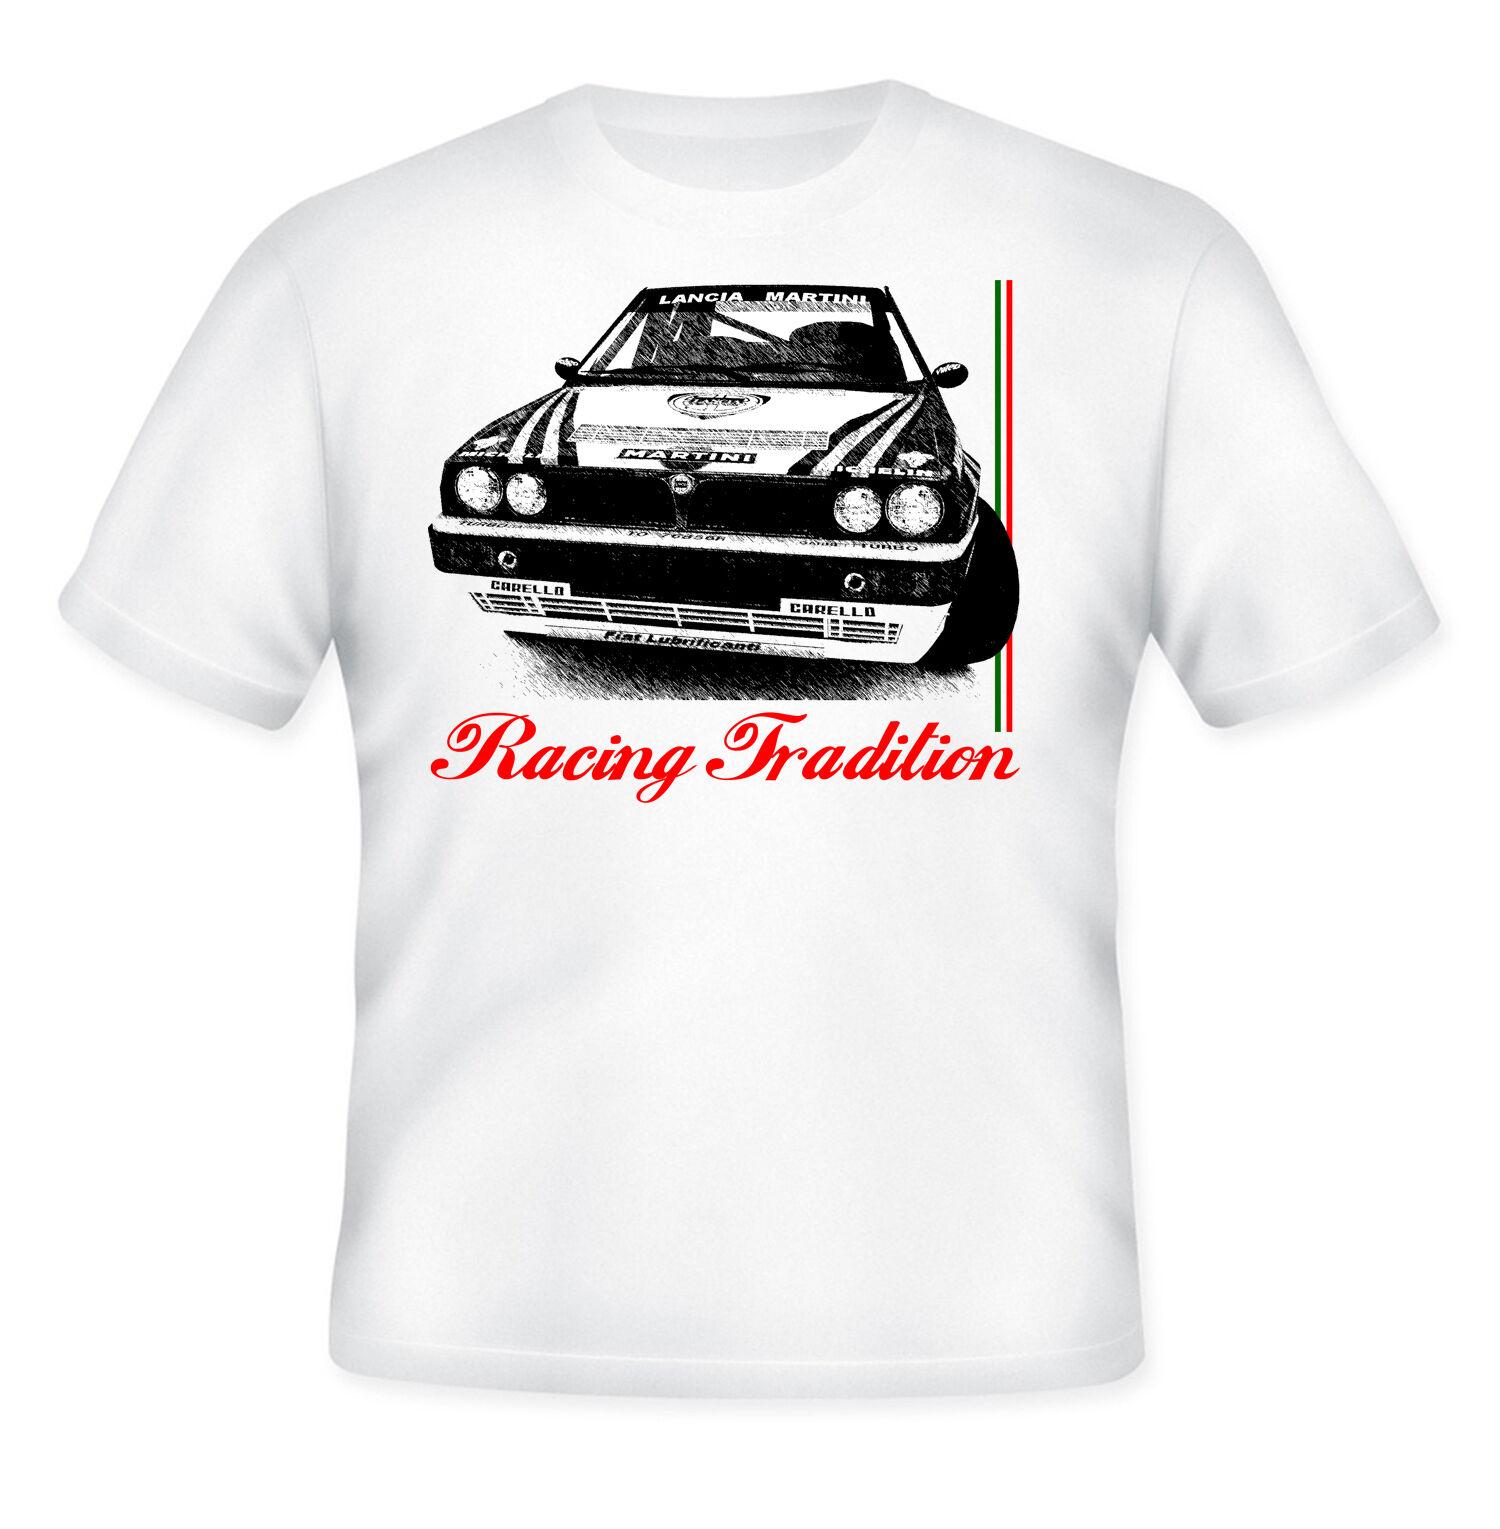 2019 Cool Lancia Delta Hf Integrale inspirado 11-Nueva camiseta gráfica s-m-l-xl-Xxl camiseta Unisex